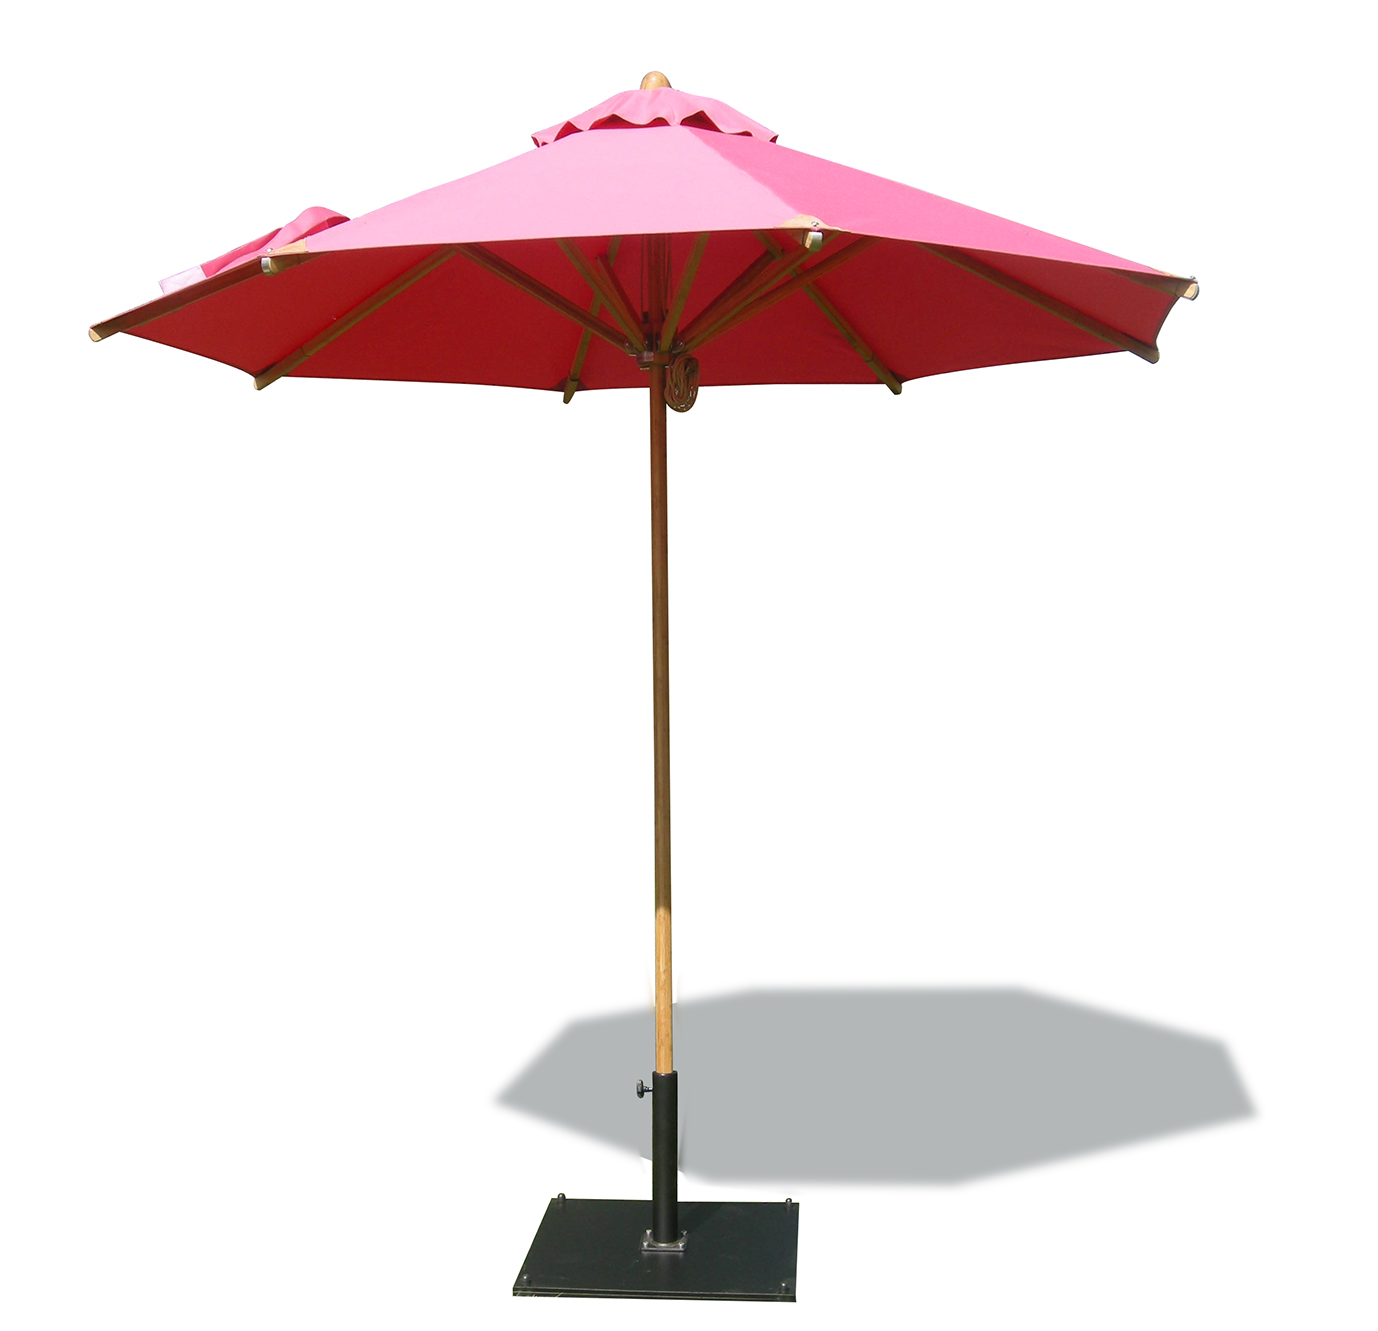 w2.5 RND bistro bambou sunbrelladetDSCN2974-b